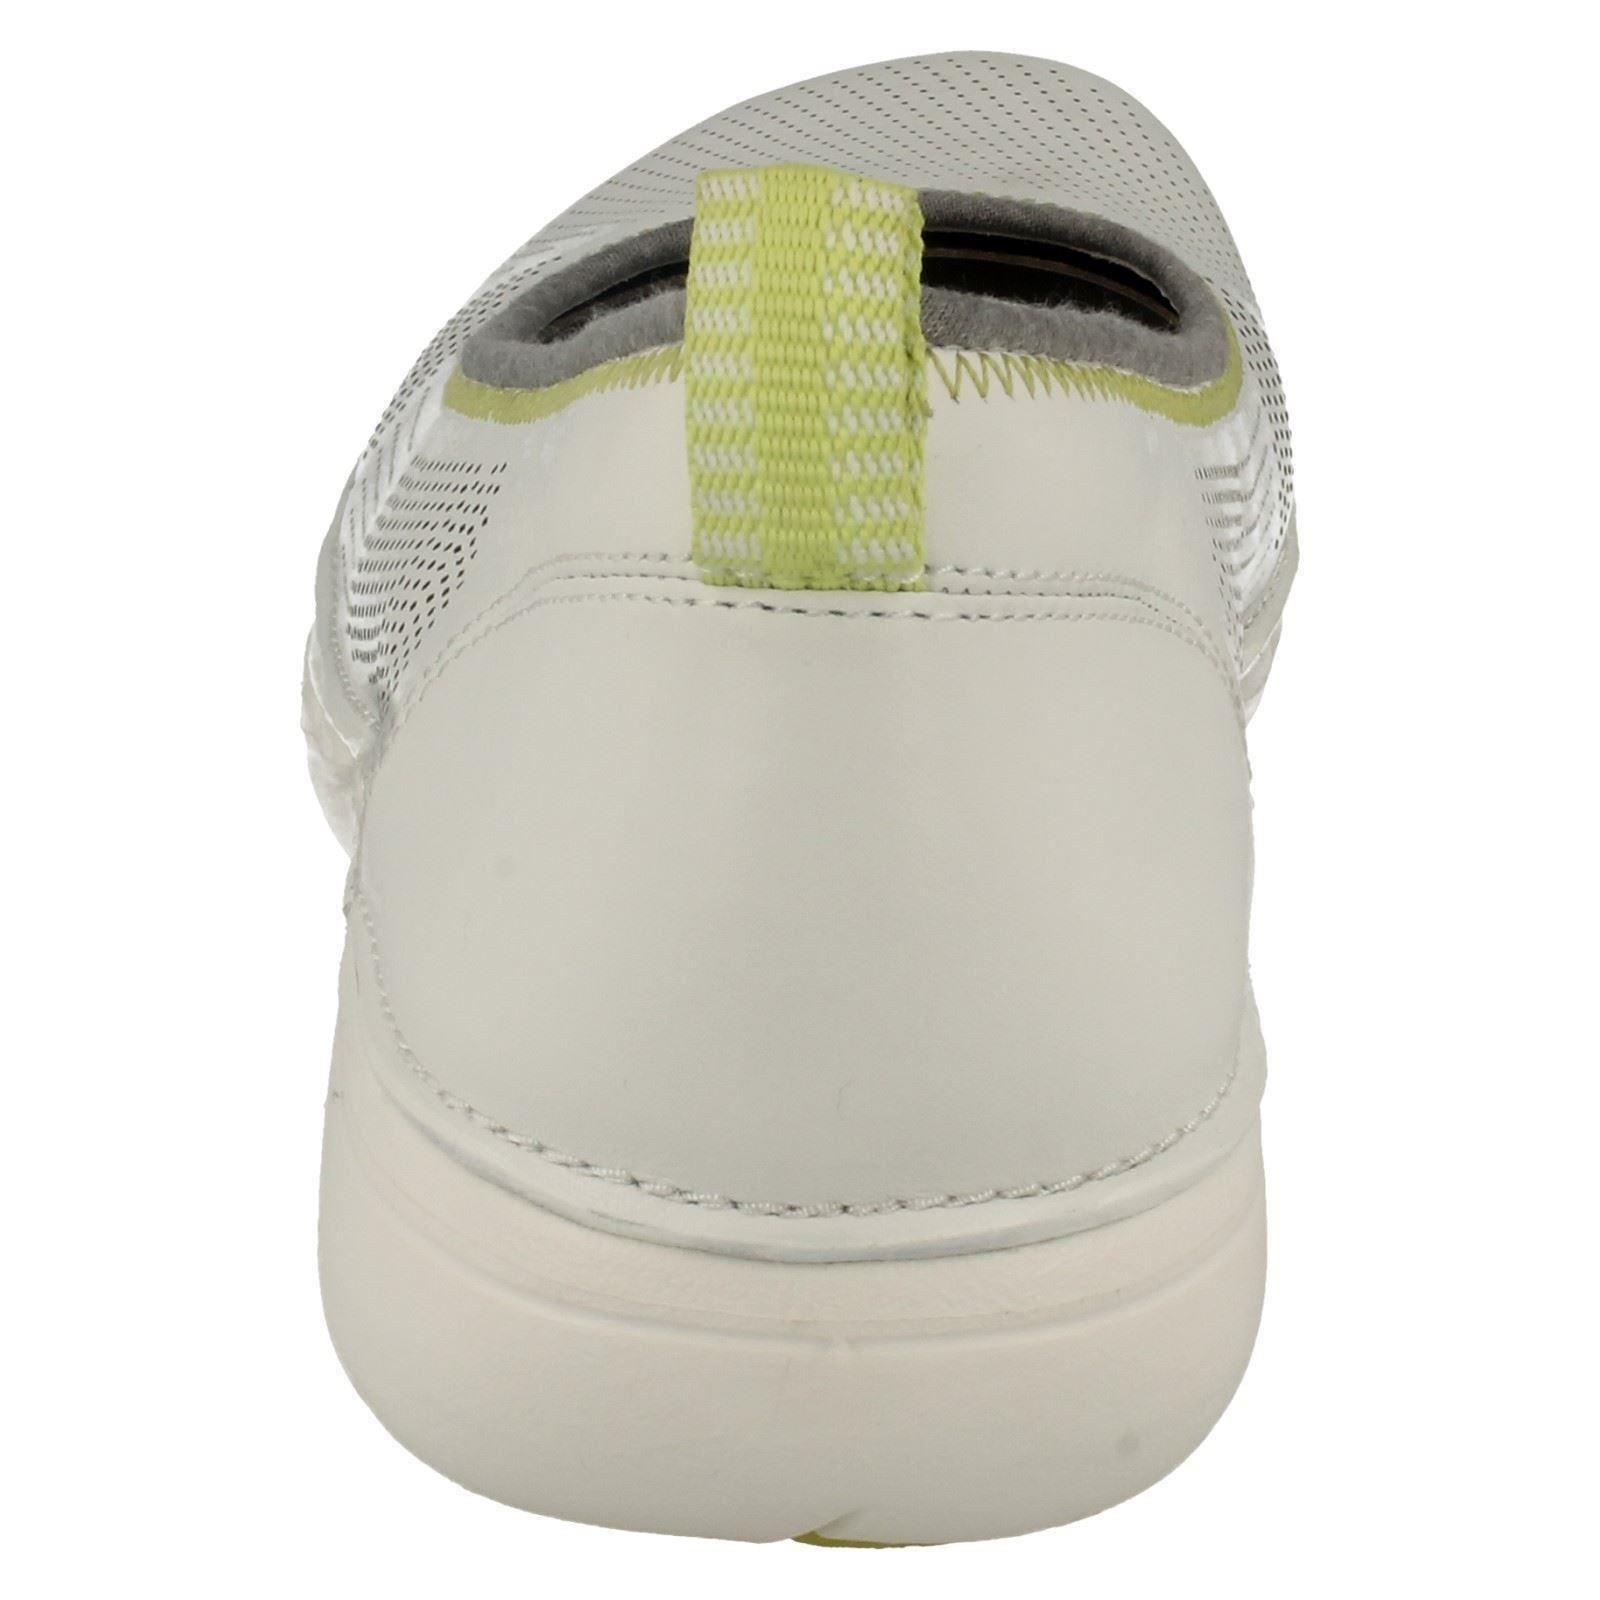 Shoes Elita Unstructured Damas White Casual Un Clarks XwOXUxB